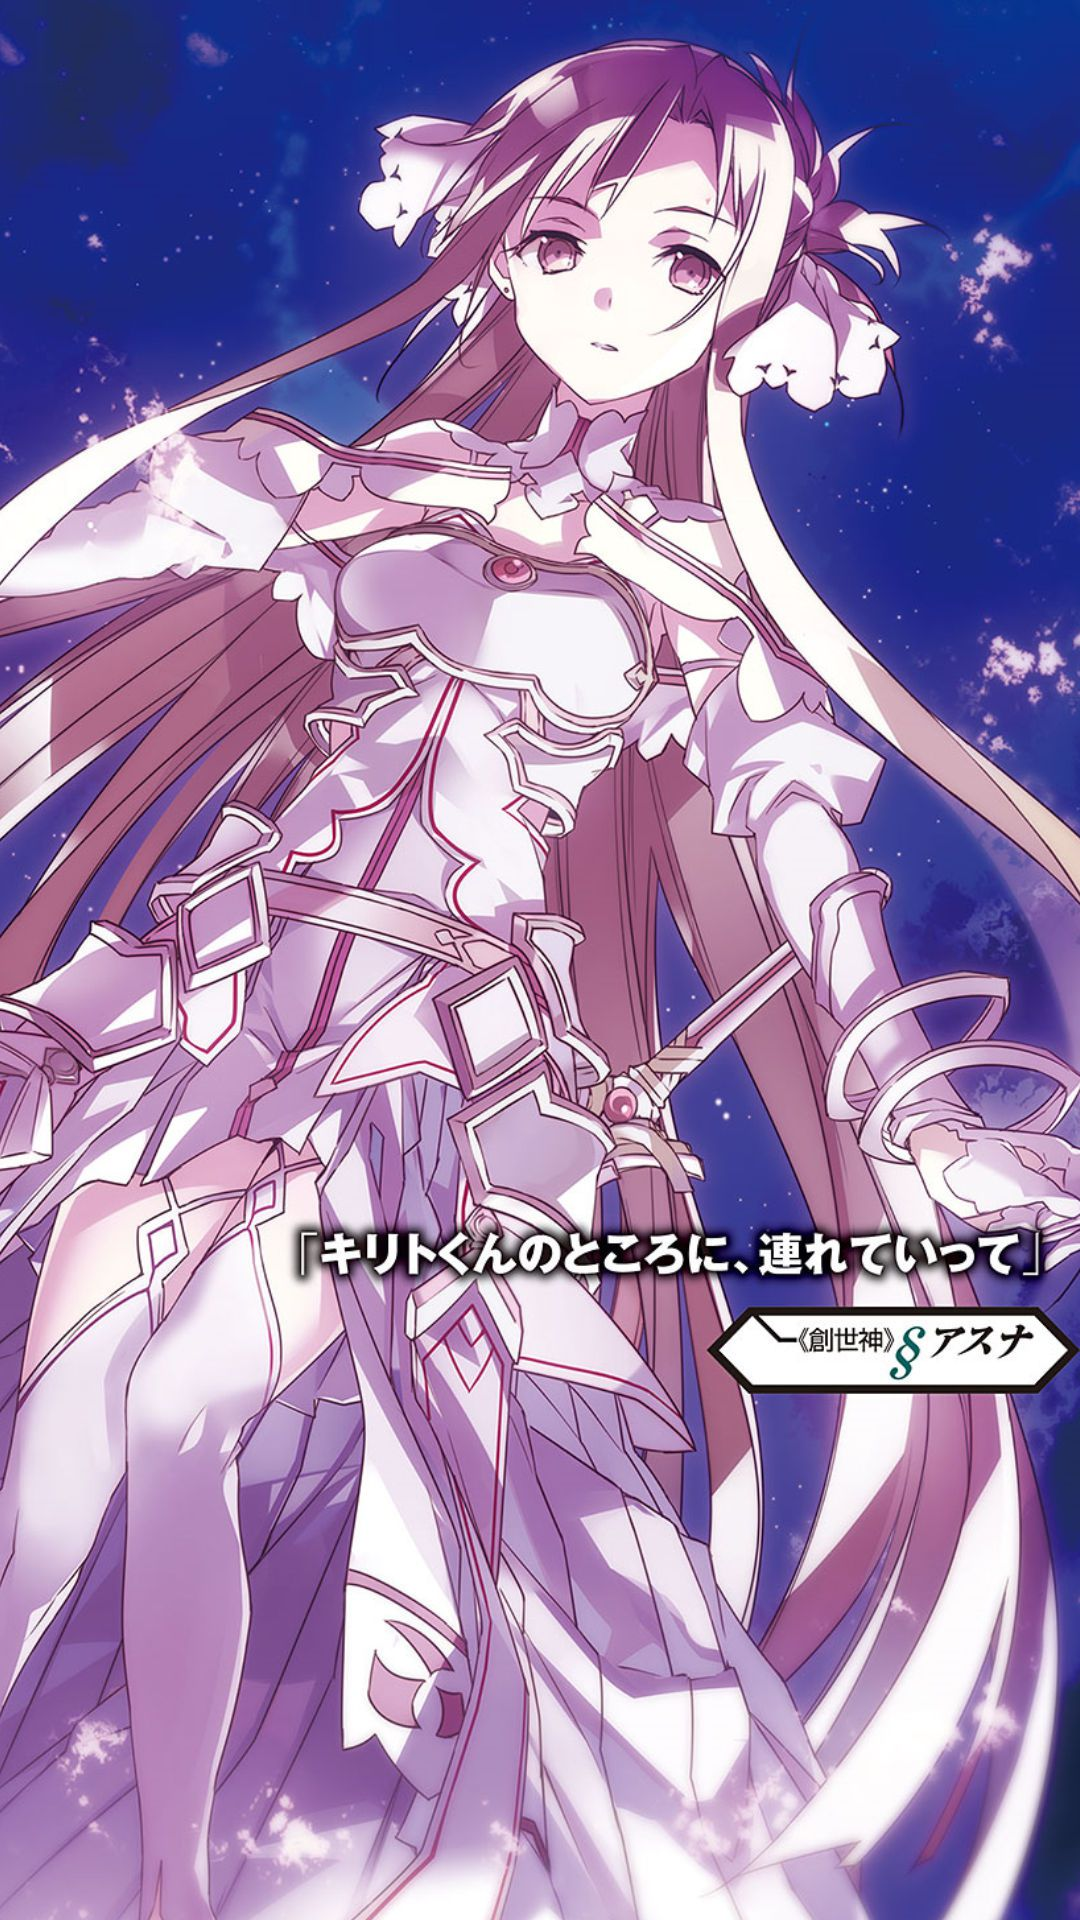 SAO-アスナiPhone壁紙,Androidスマホ用画像